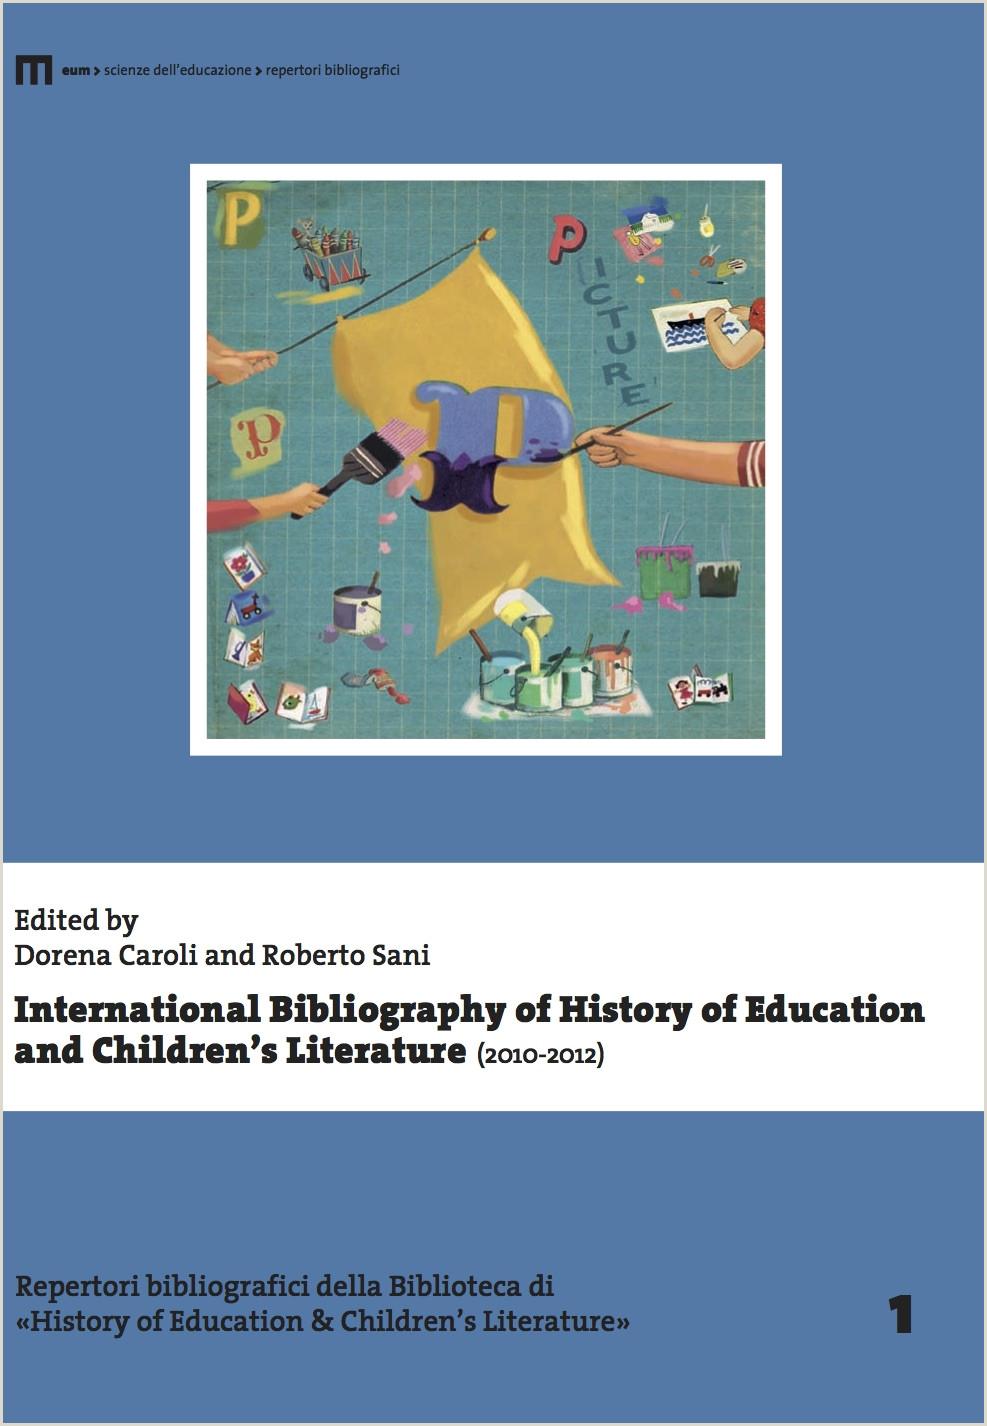 Formato De Hoja De Vida Minerva Pdf Caroli D & Sani L Eds International Bibliography Of